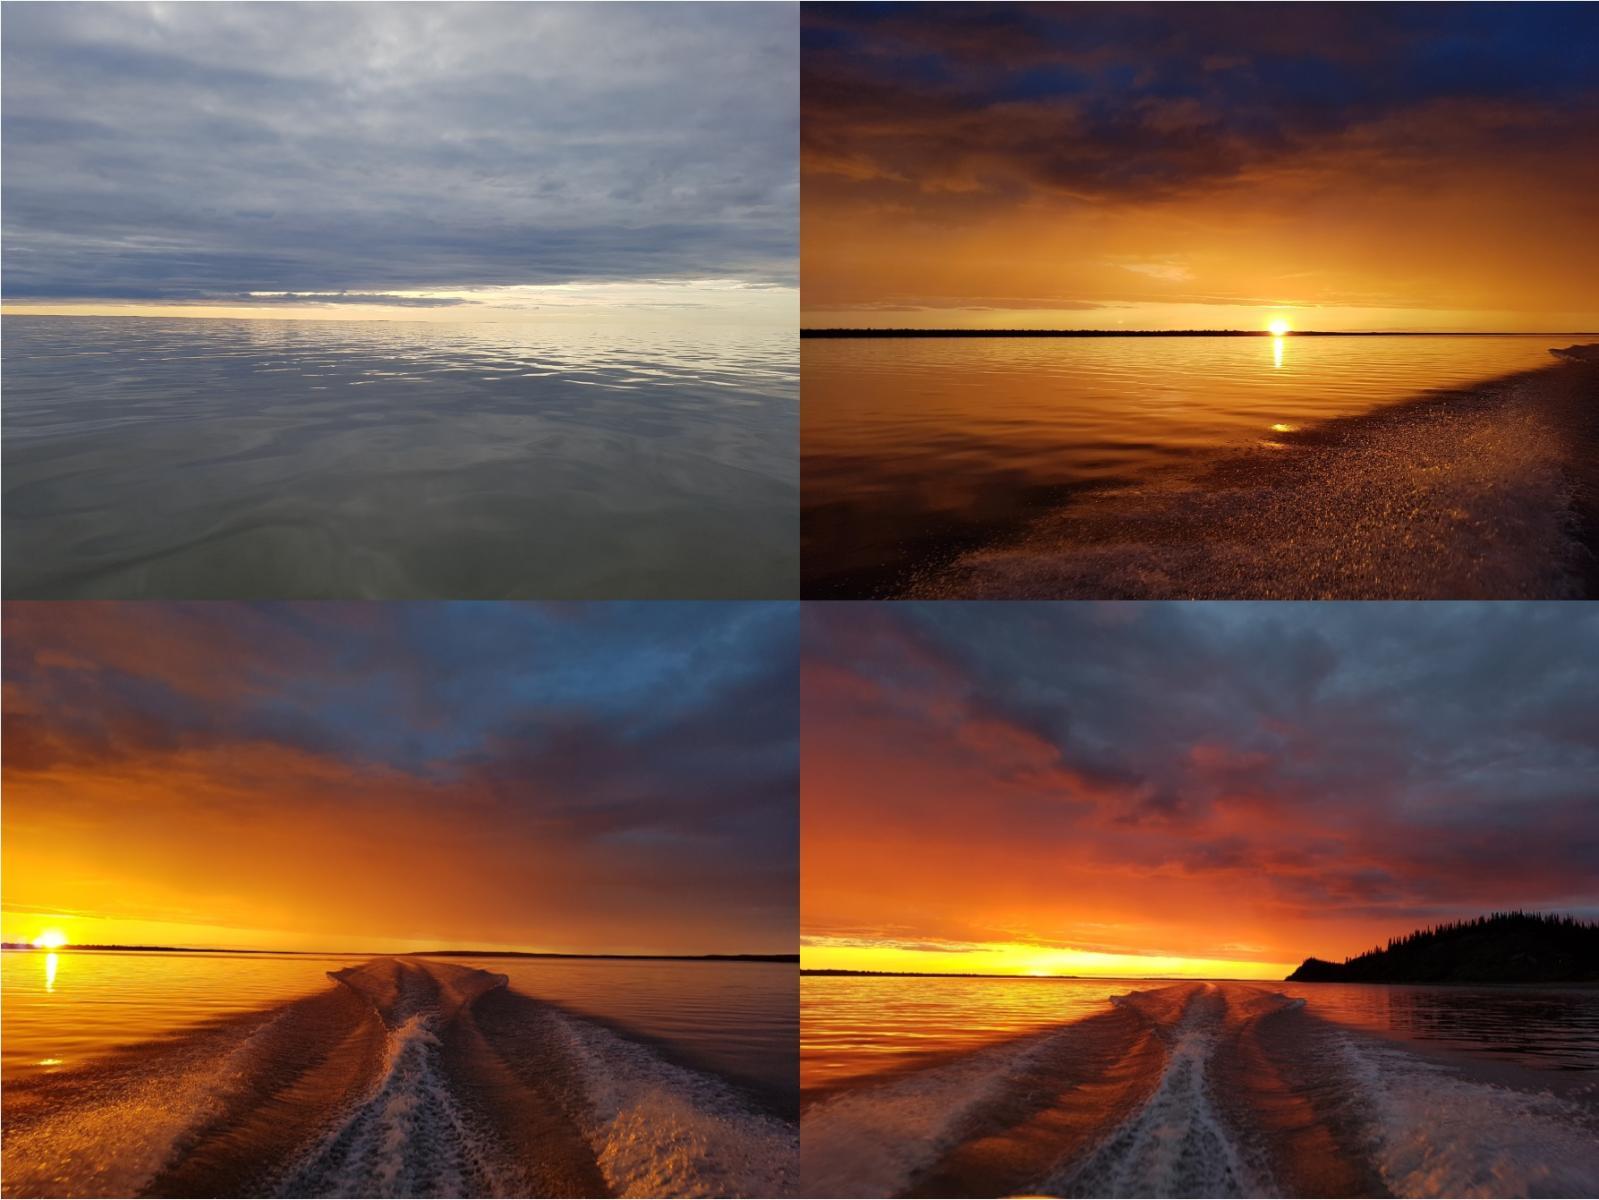 Sunset on the Mackenzie Delta